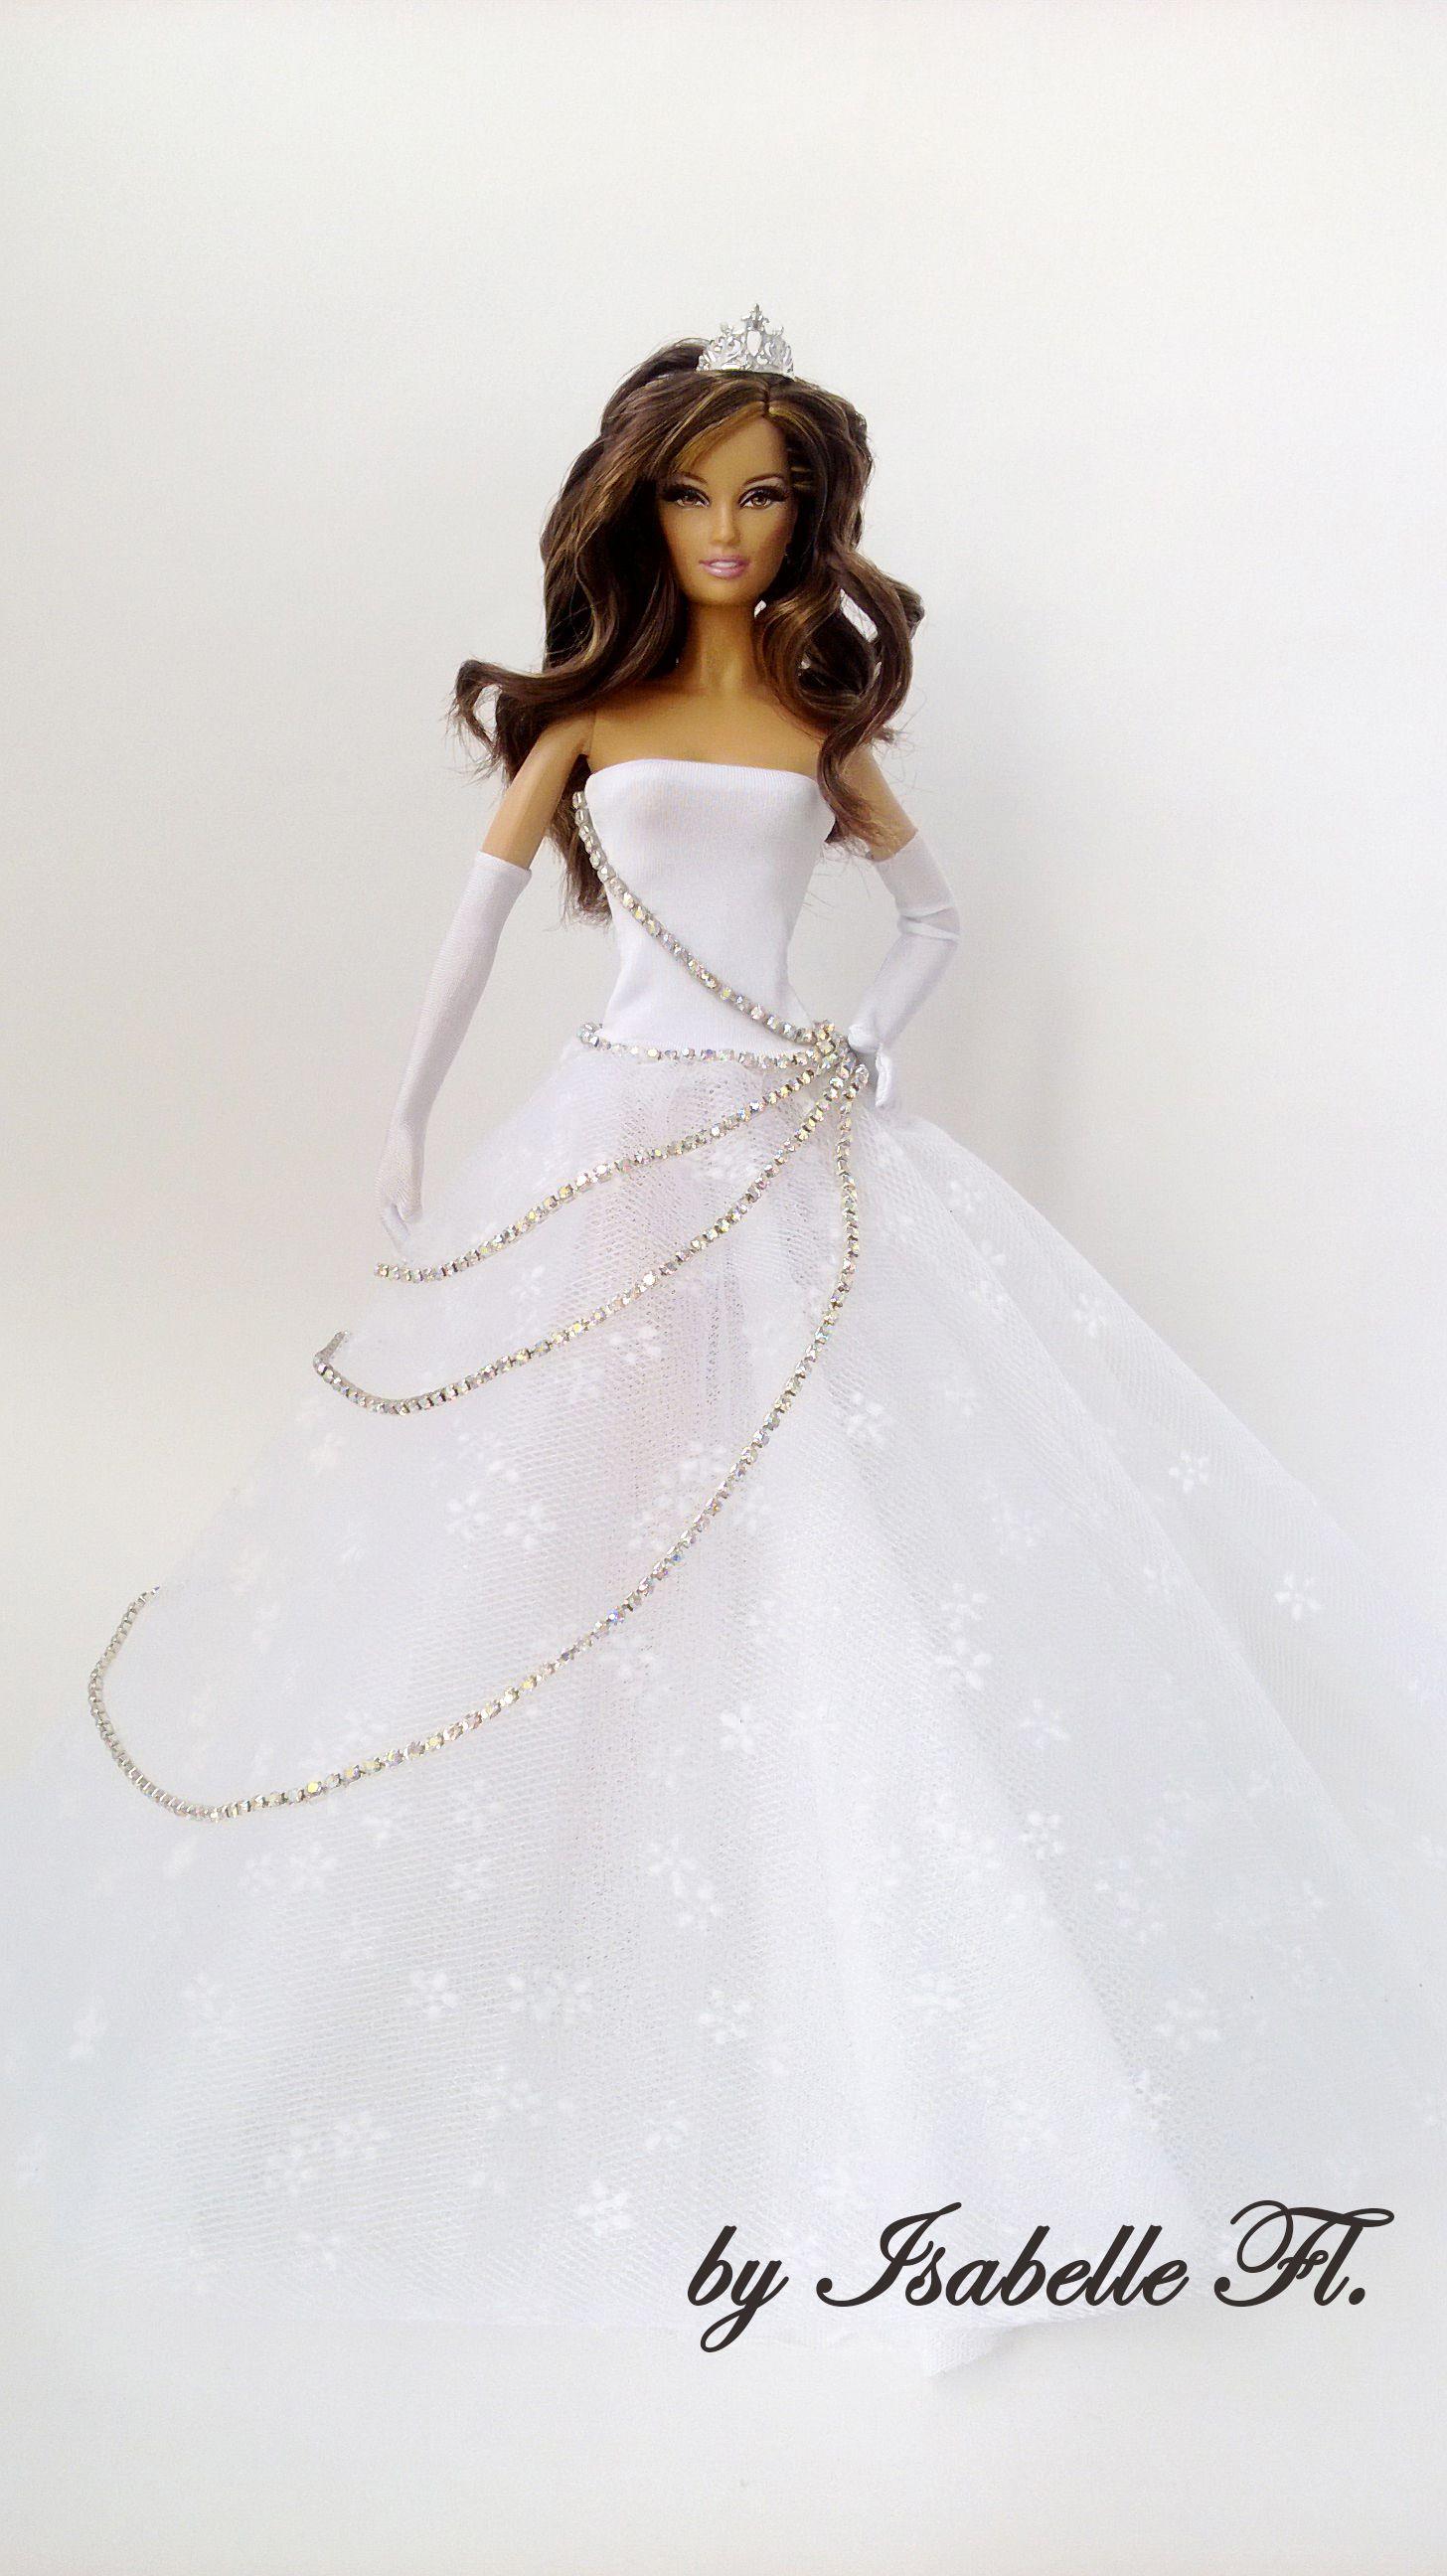 1..4 Lara\'s wedding dress by Isabelle Fl | BARBIE SCHNITTMUSTER ...